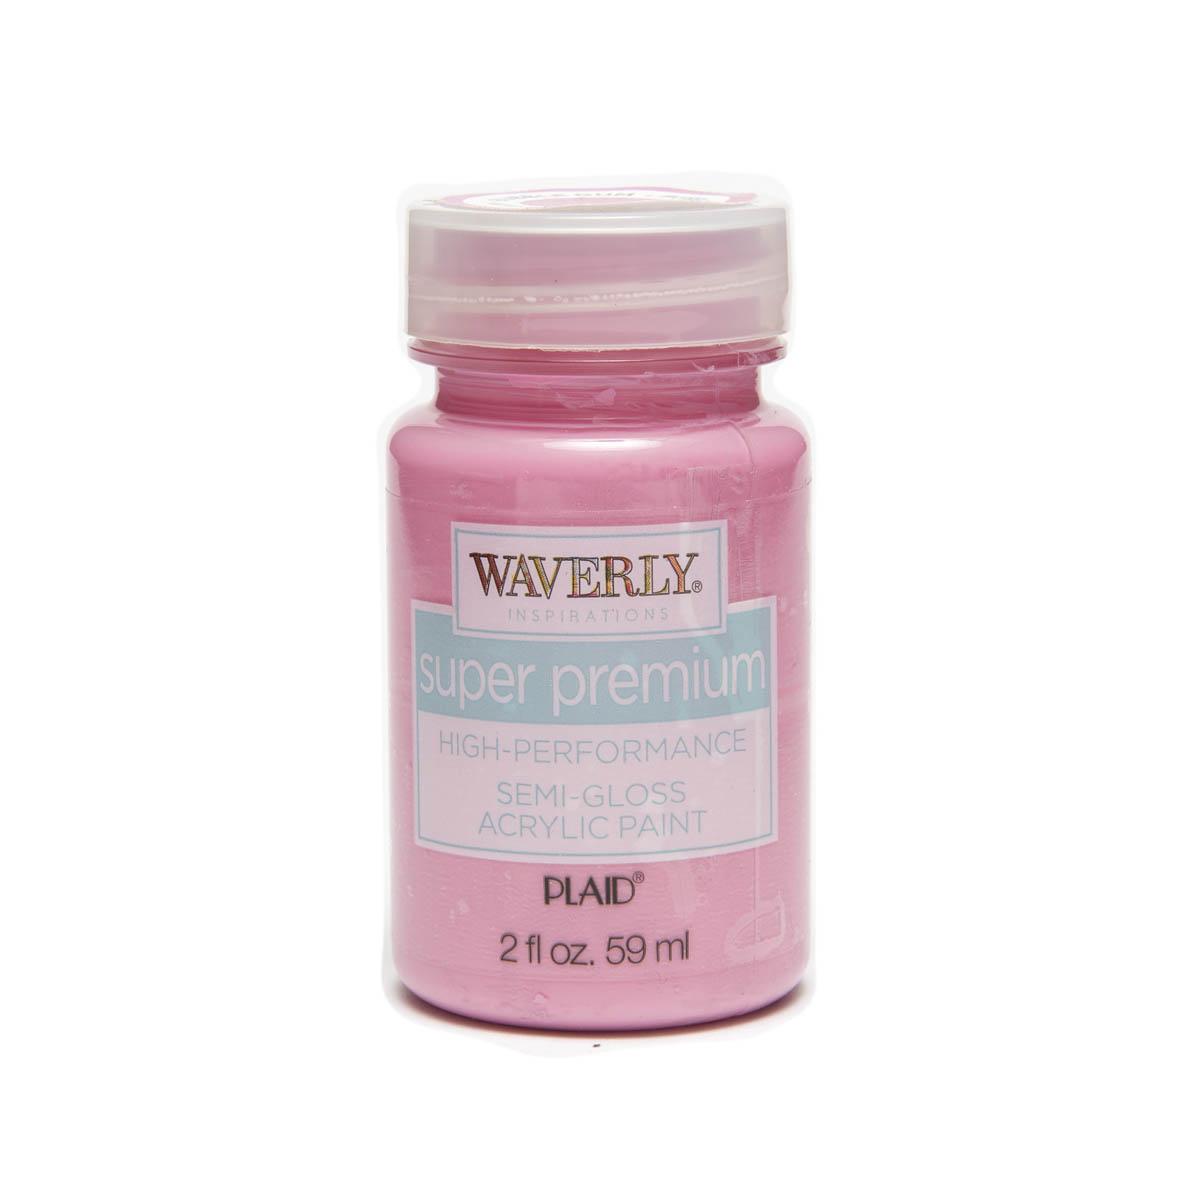 Waverly ® Inspirations Super Premium Semi-Gloss Acrylic Paint - Bubble Gum, 2 oz.